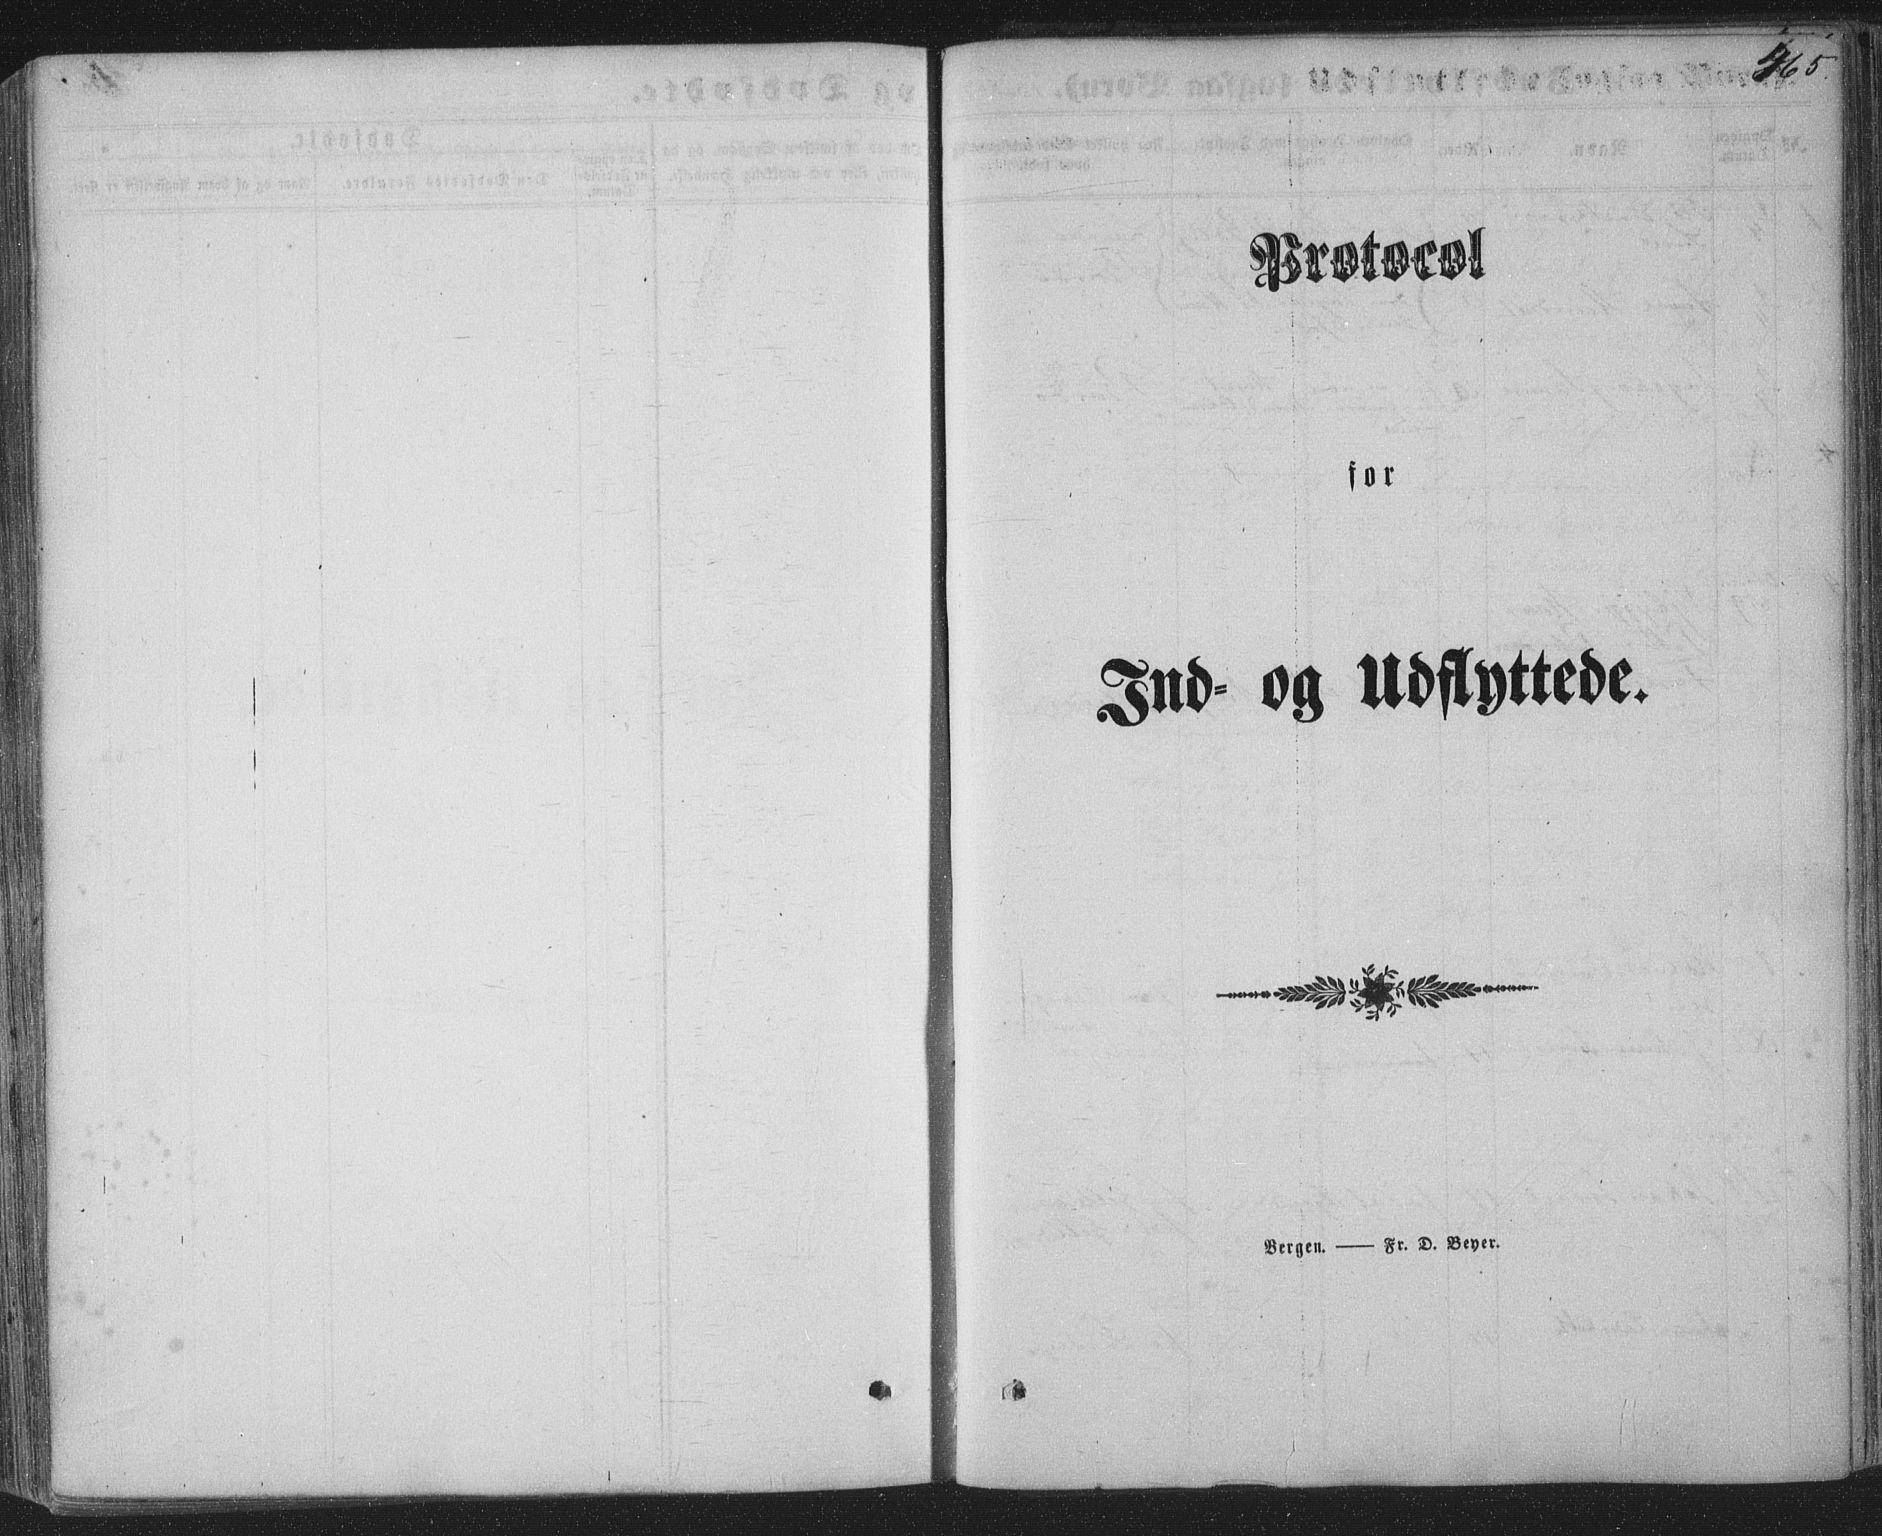 SAT, Ministerialprotokoller, klokkerbøker og fødselsregistre - Nordland, 863/L0896: Ministerialbok nr. 863A08, 1861-1871, s. 465